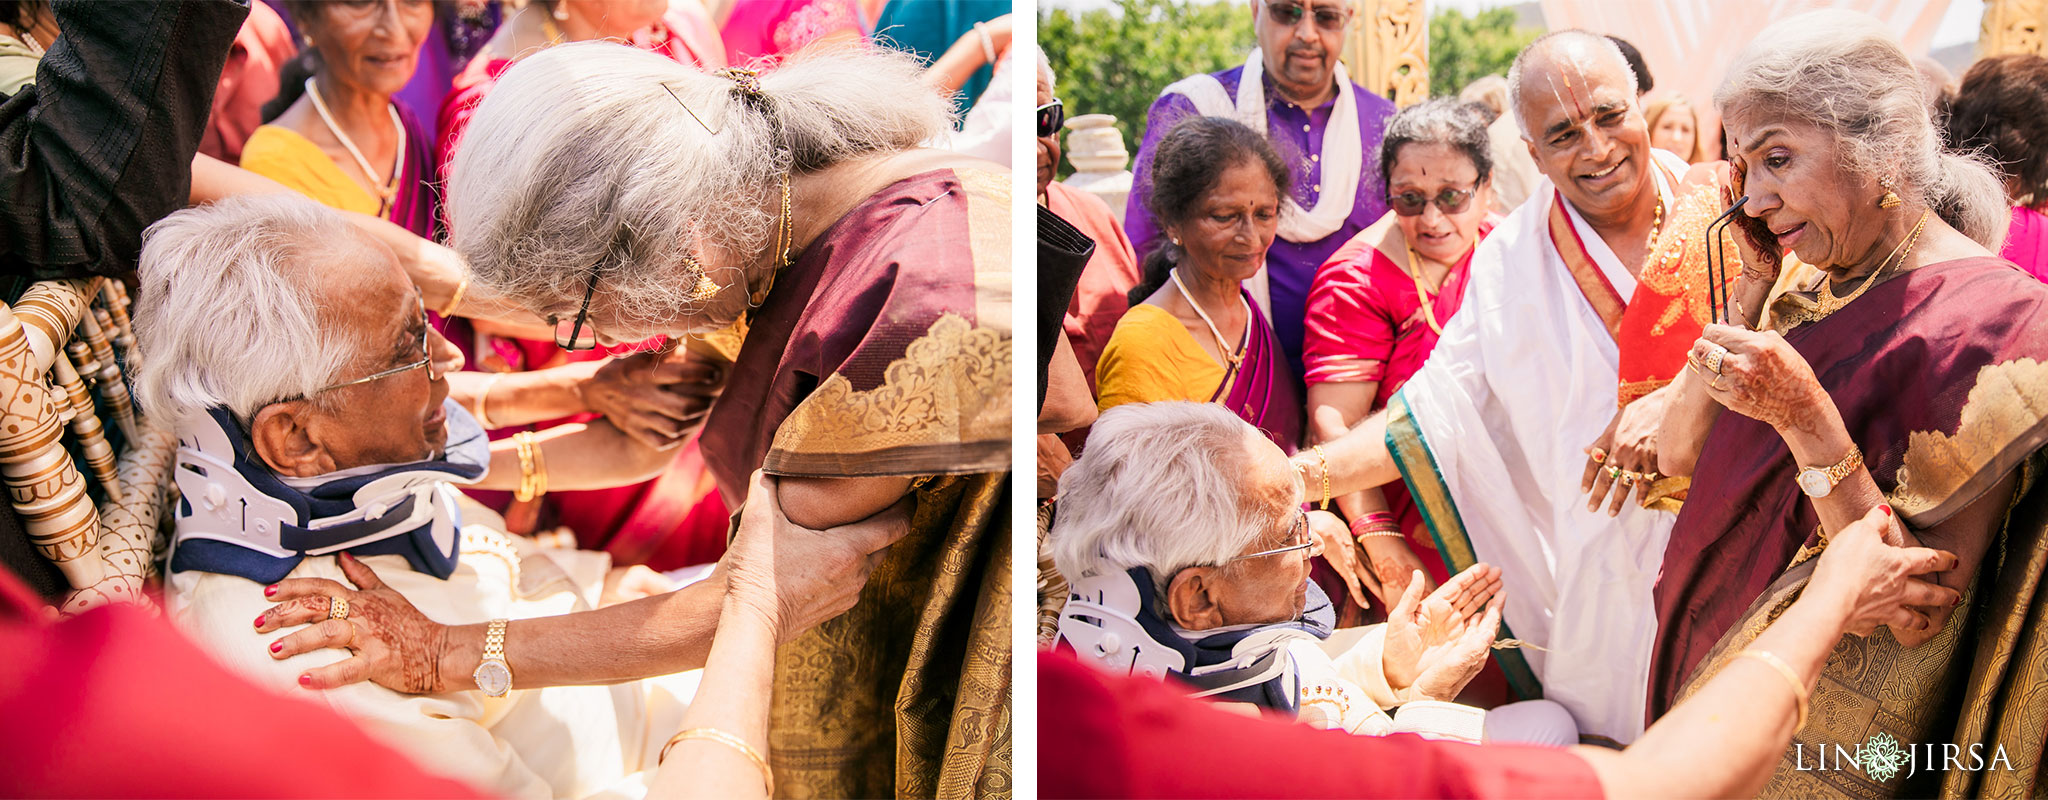 039 sherwood country club indian wedding ceremony photojournalism photography